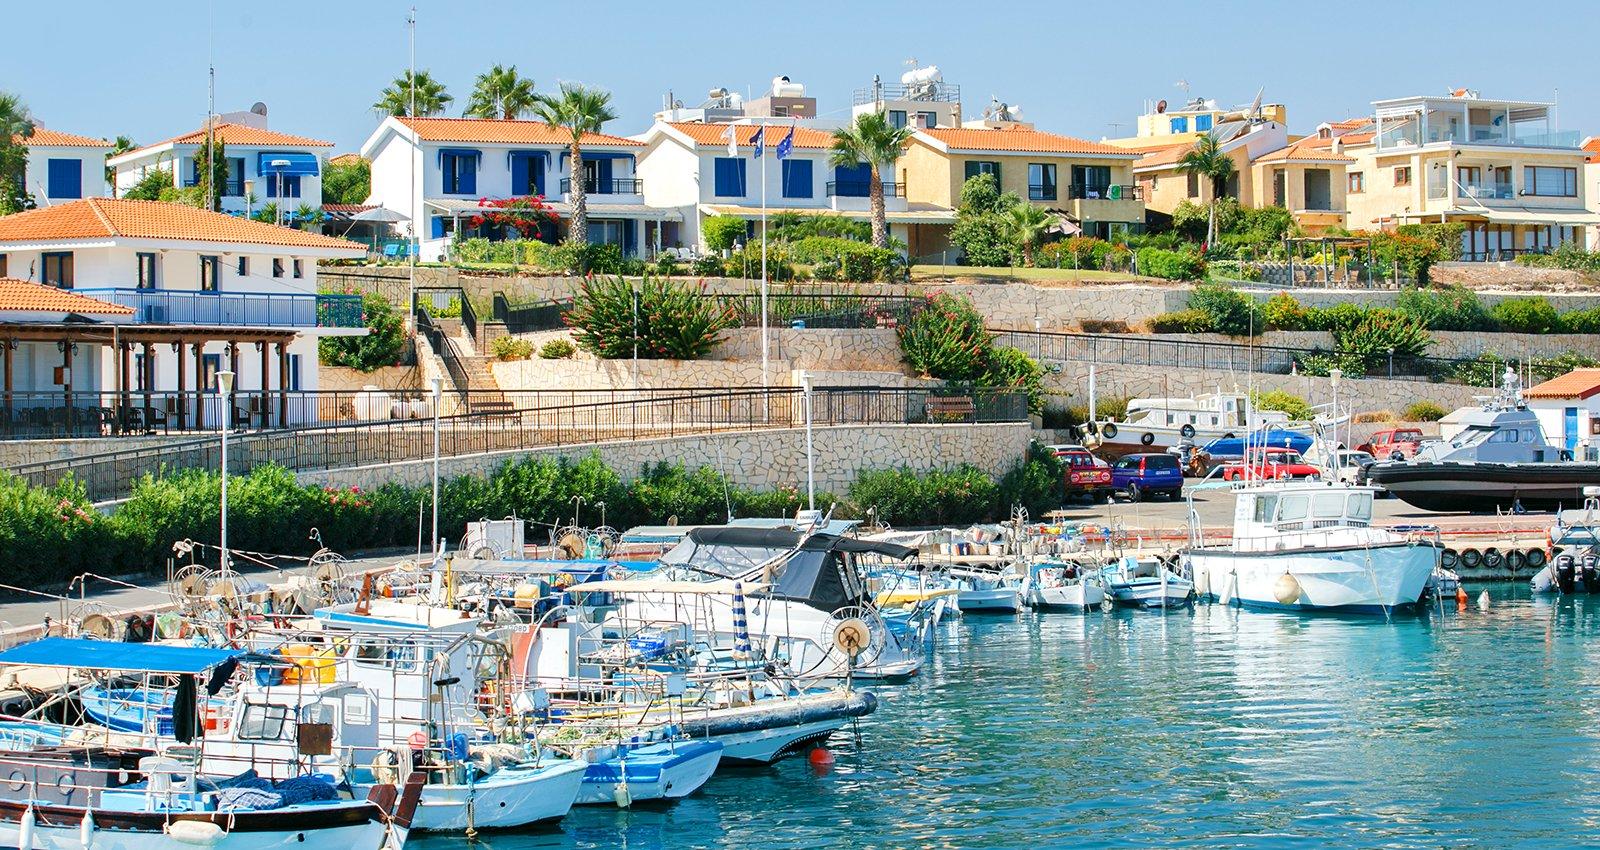 Marina in Protaros, Cyprus.